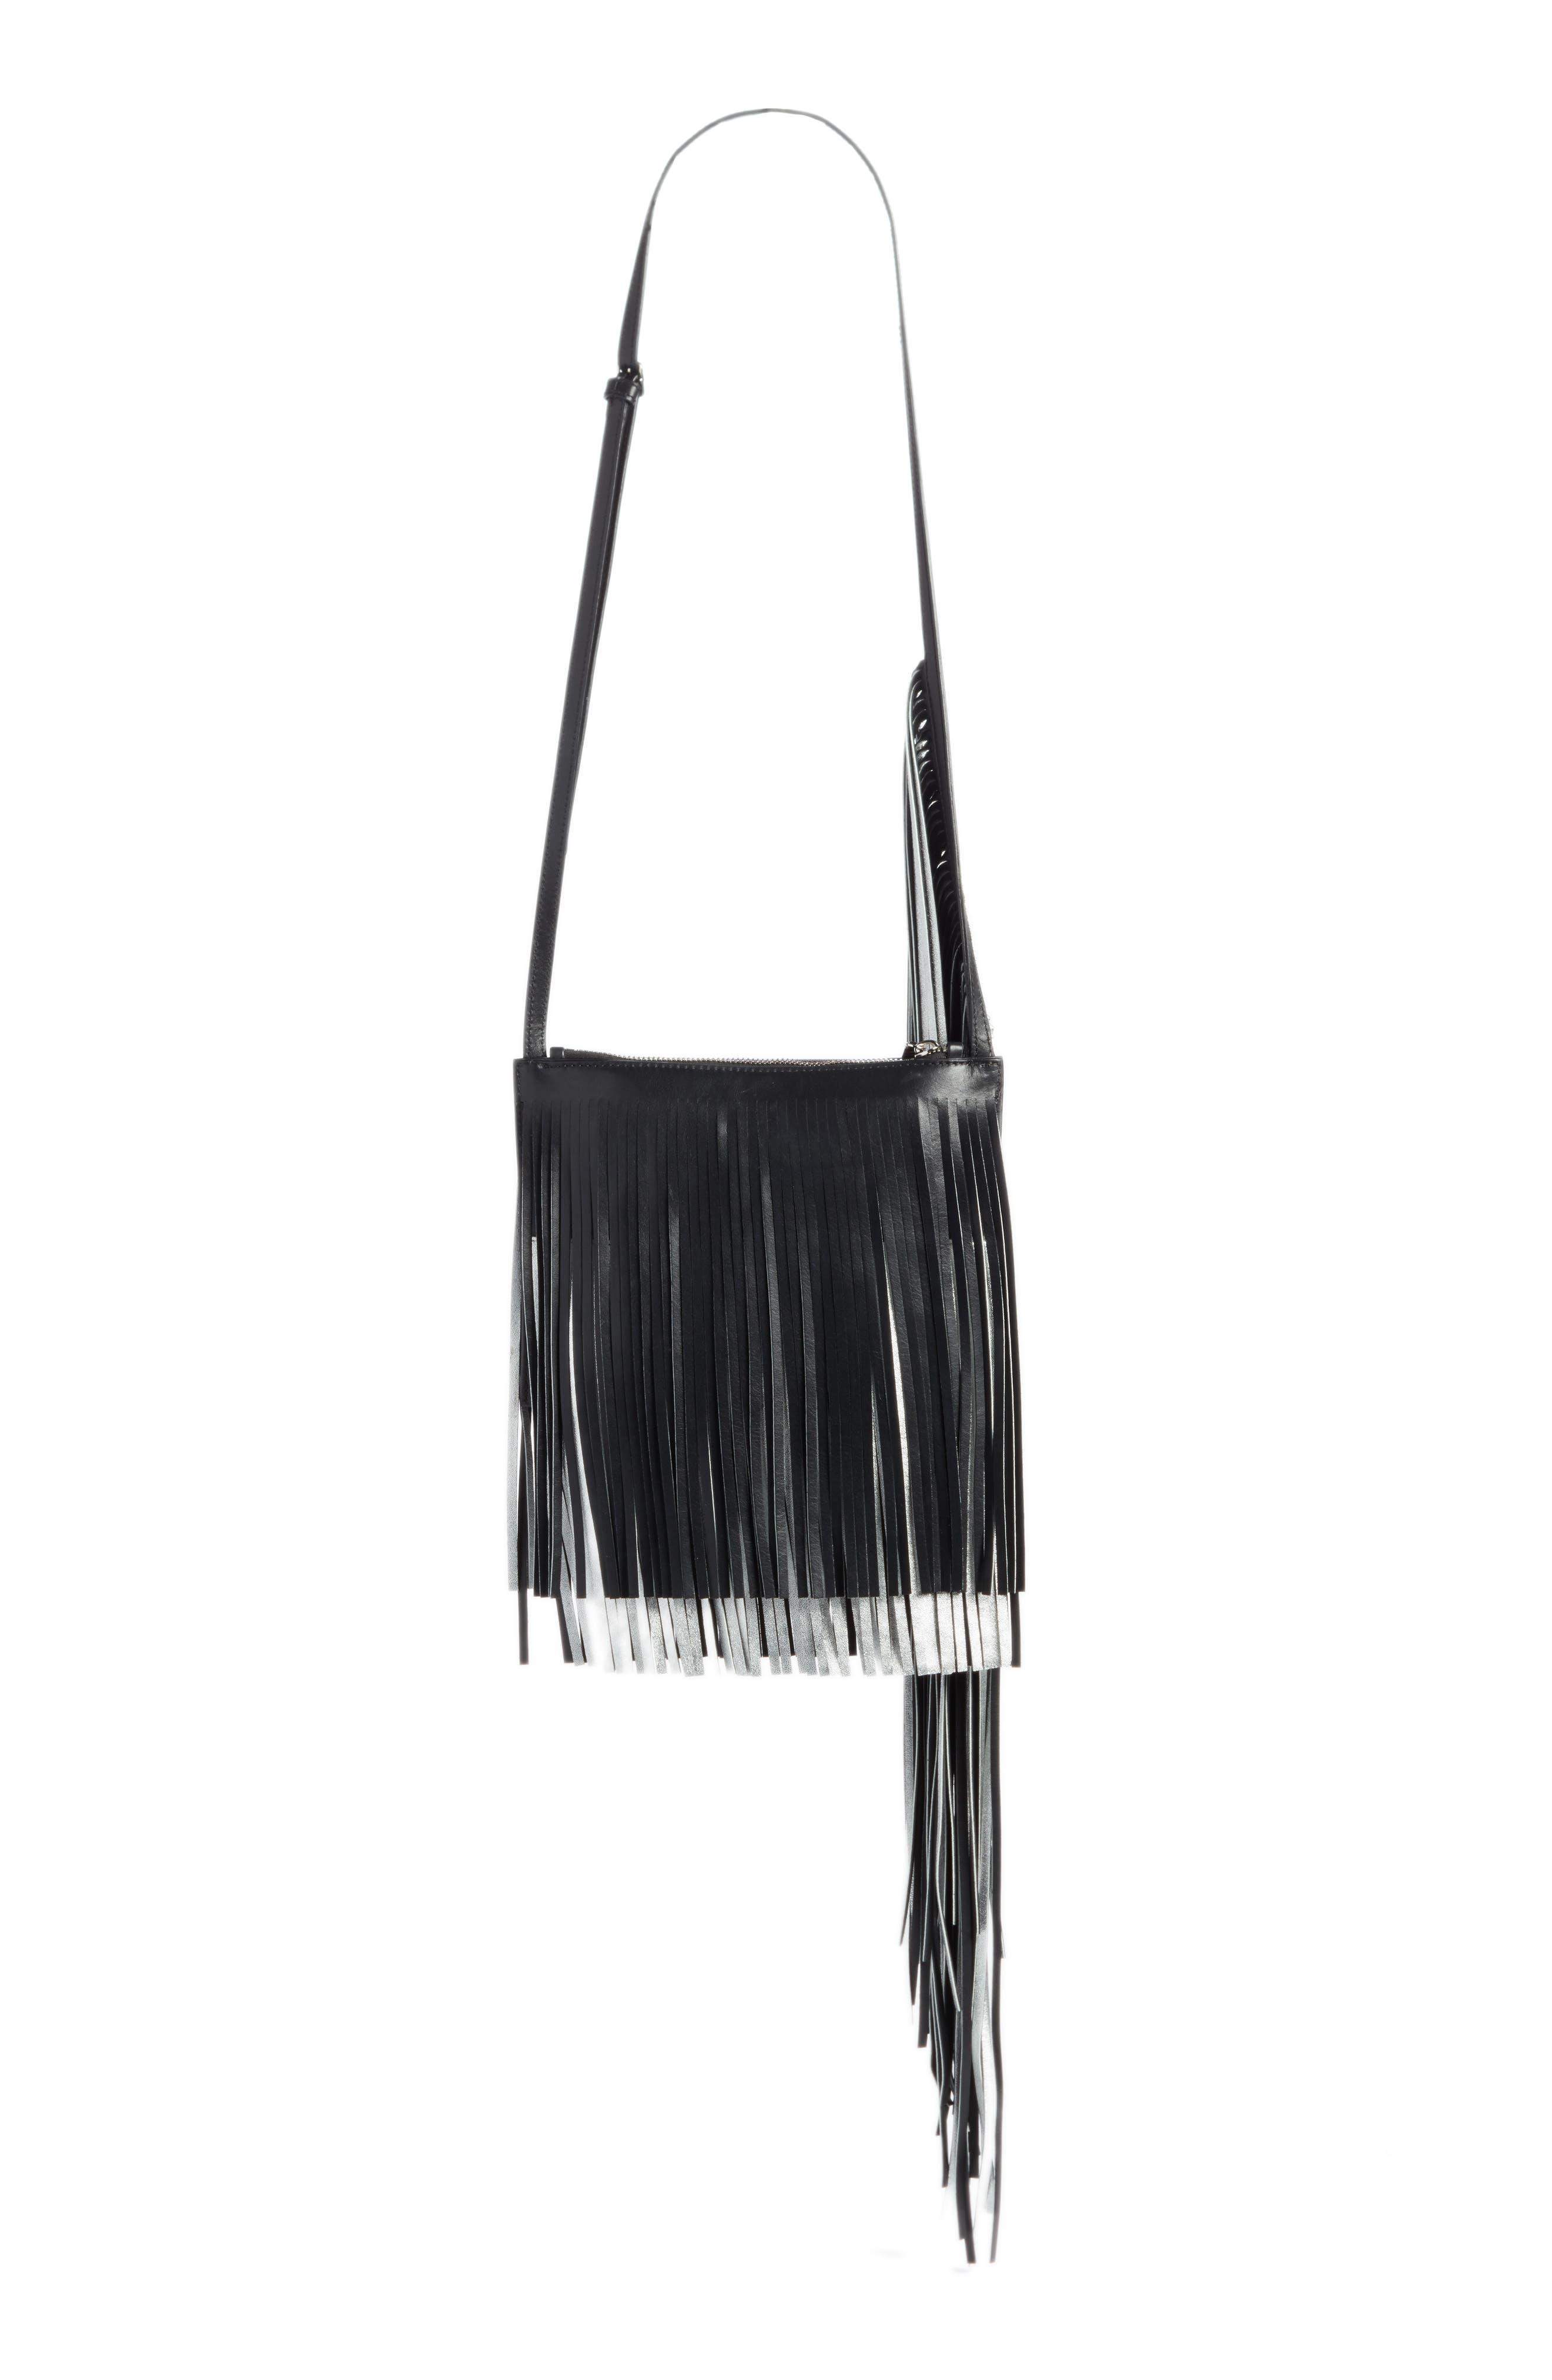 x Layered Fringe Leather Crossbody Bag,                             Alternate thumbnail 2, color,                             Black